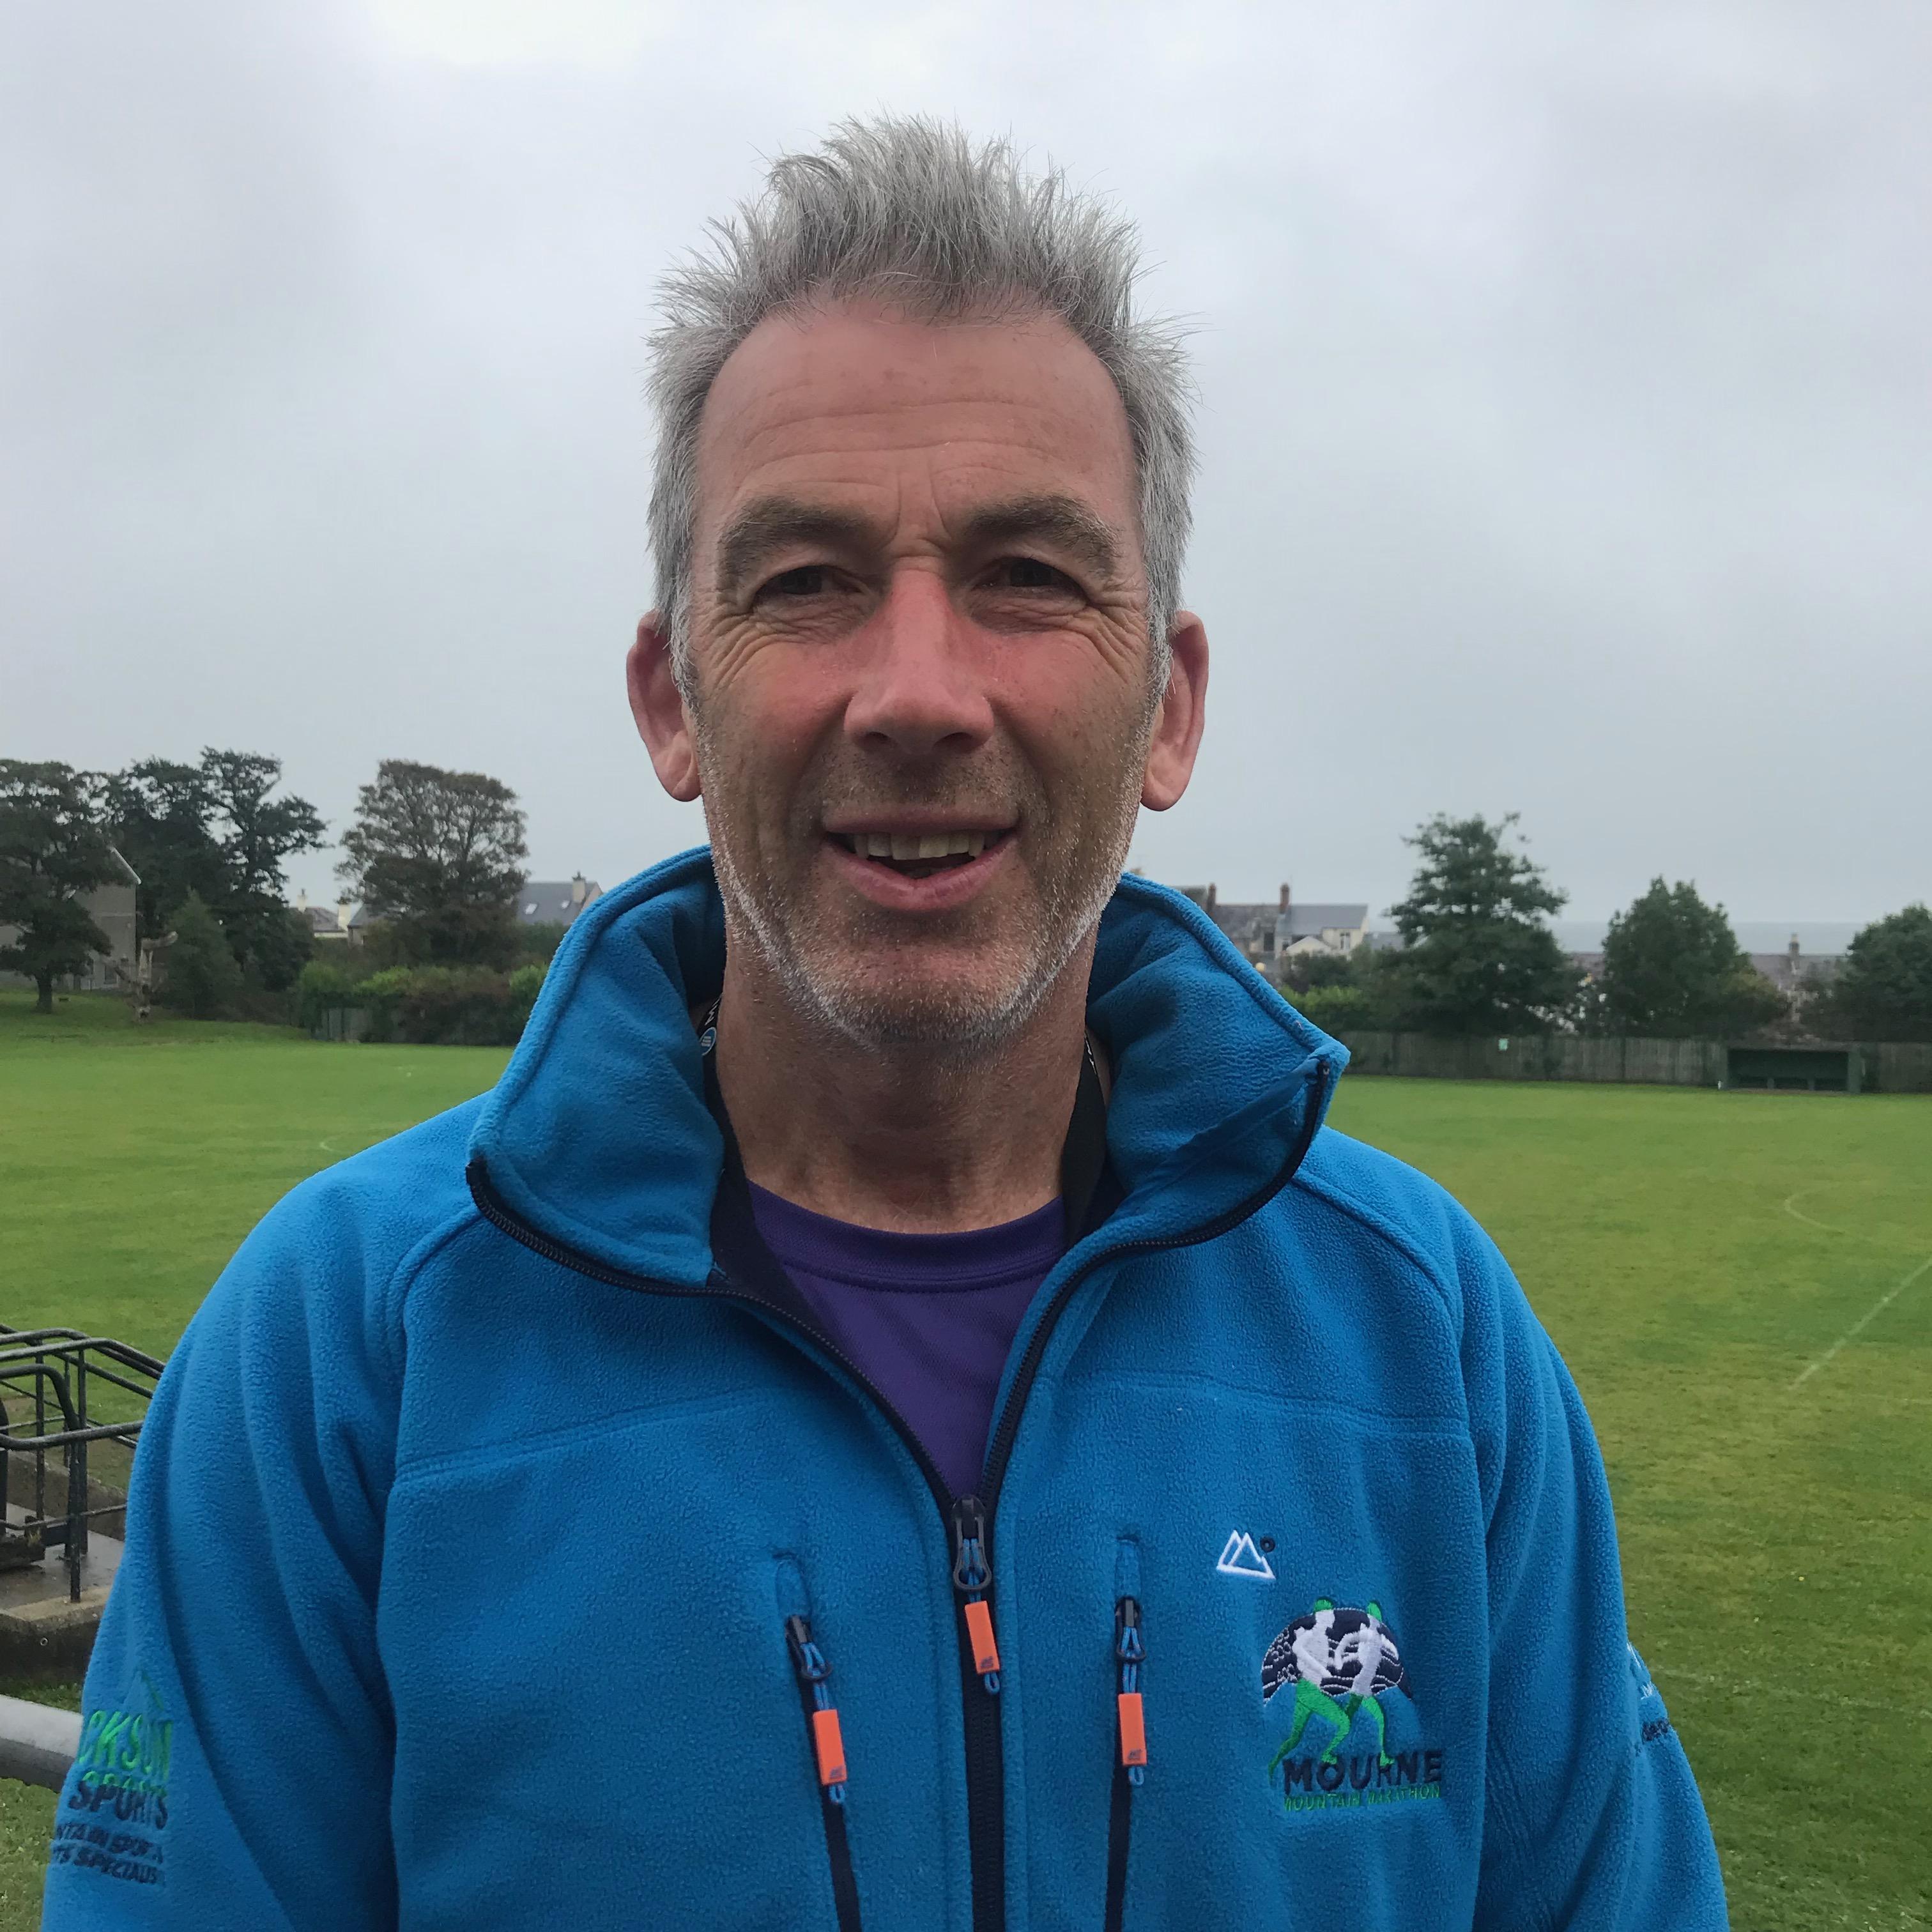 Gareth McKeown Course Controller, Publicity & Sponsorship Manager